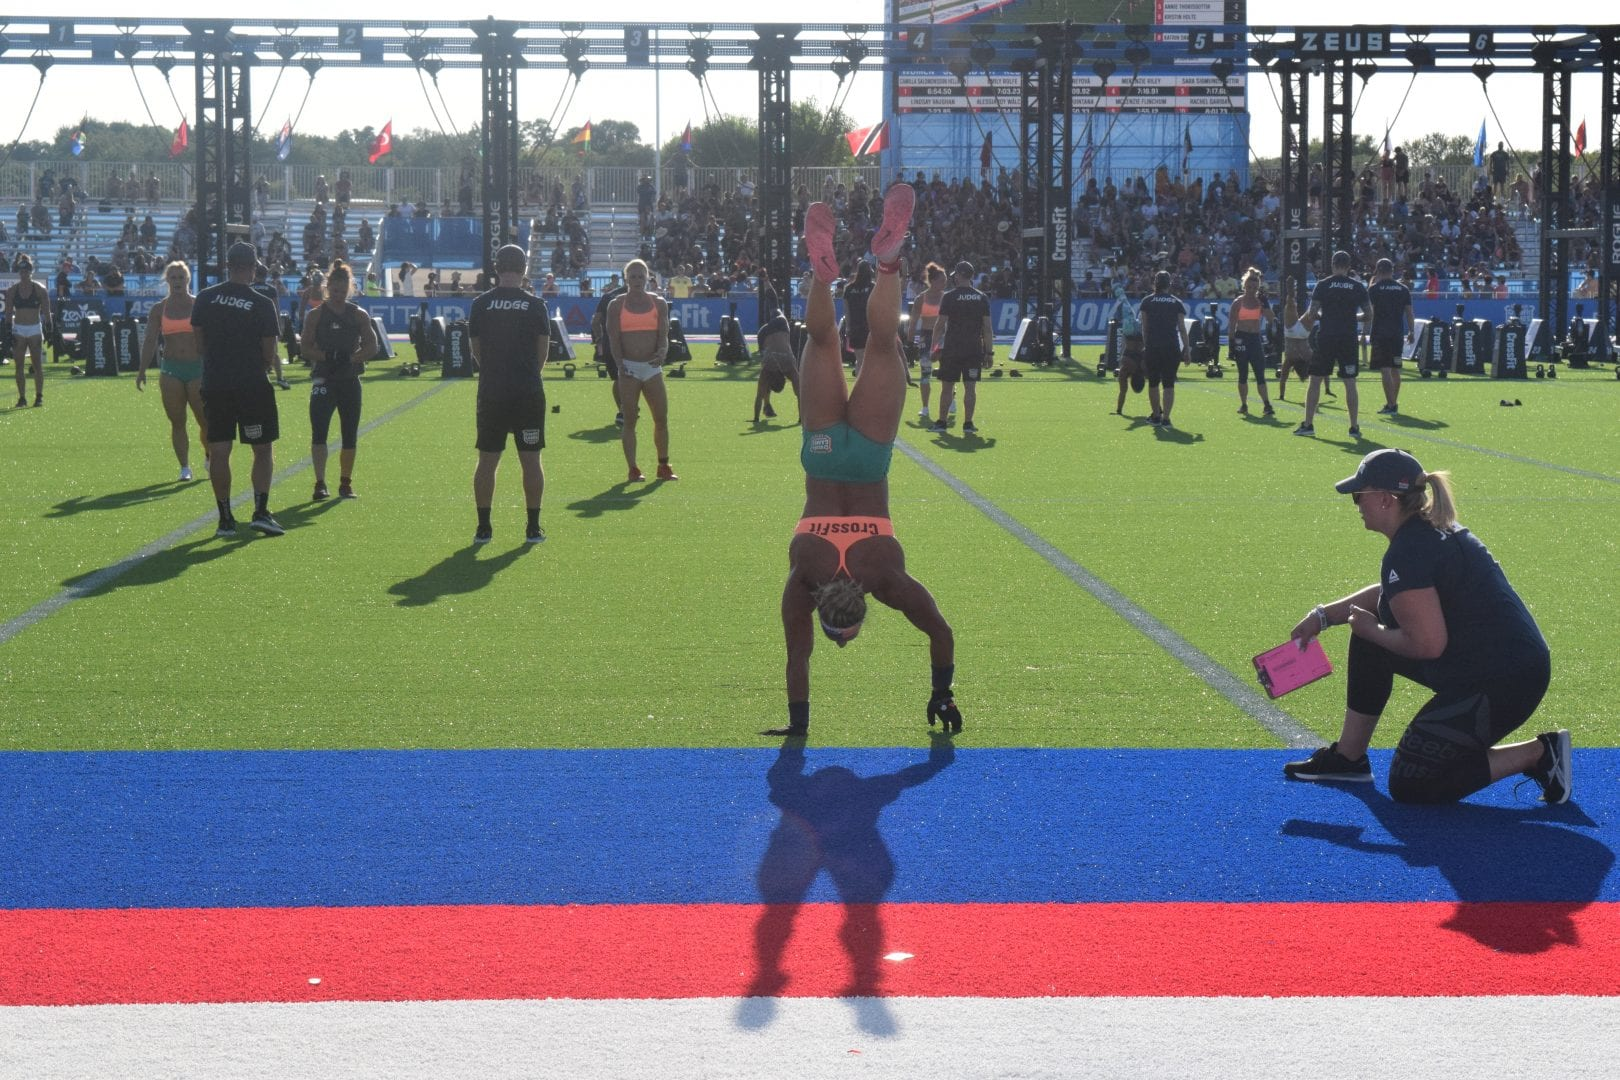 Amanda Barnhart handstand walks across the finish line at the 2019 CrossFit Games